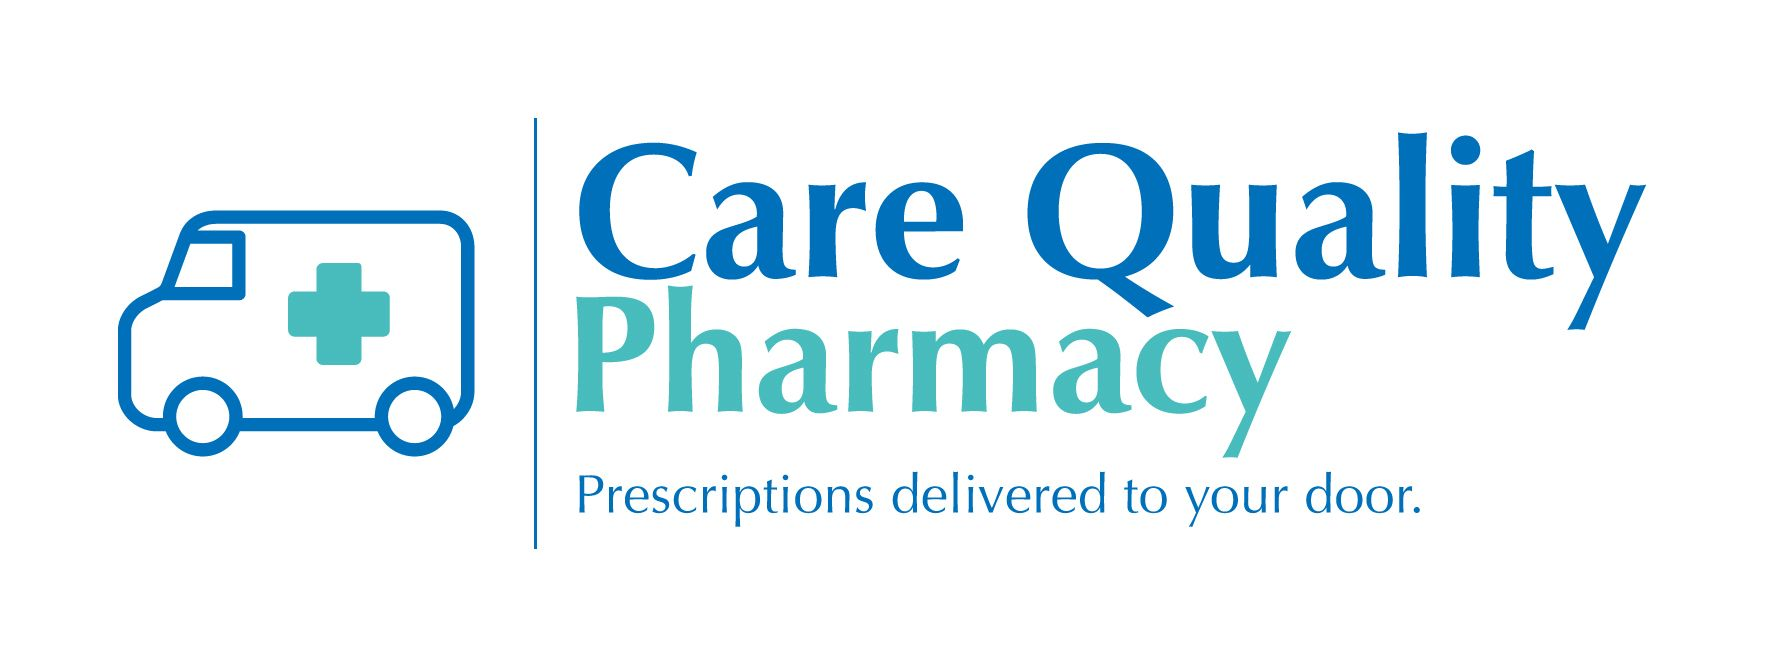 Care Quality Pharmacy